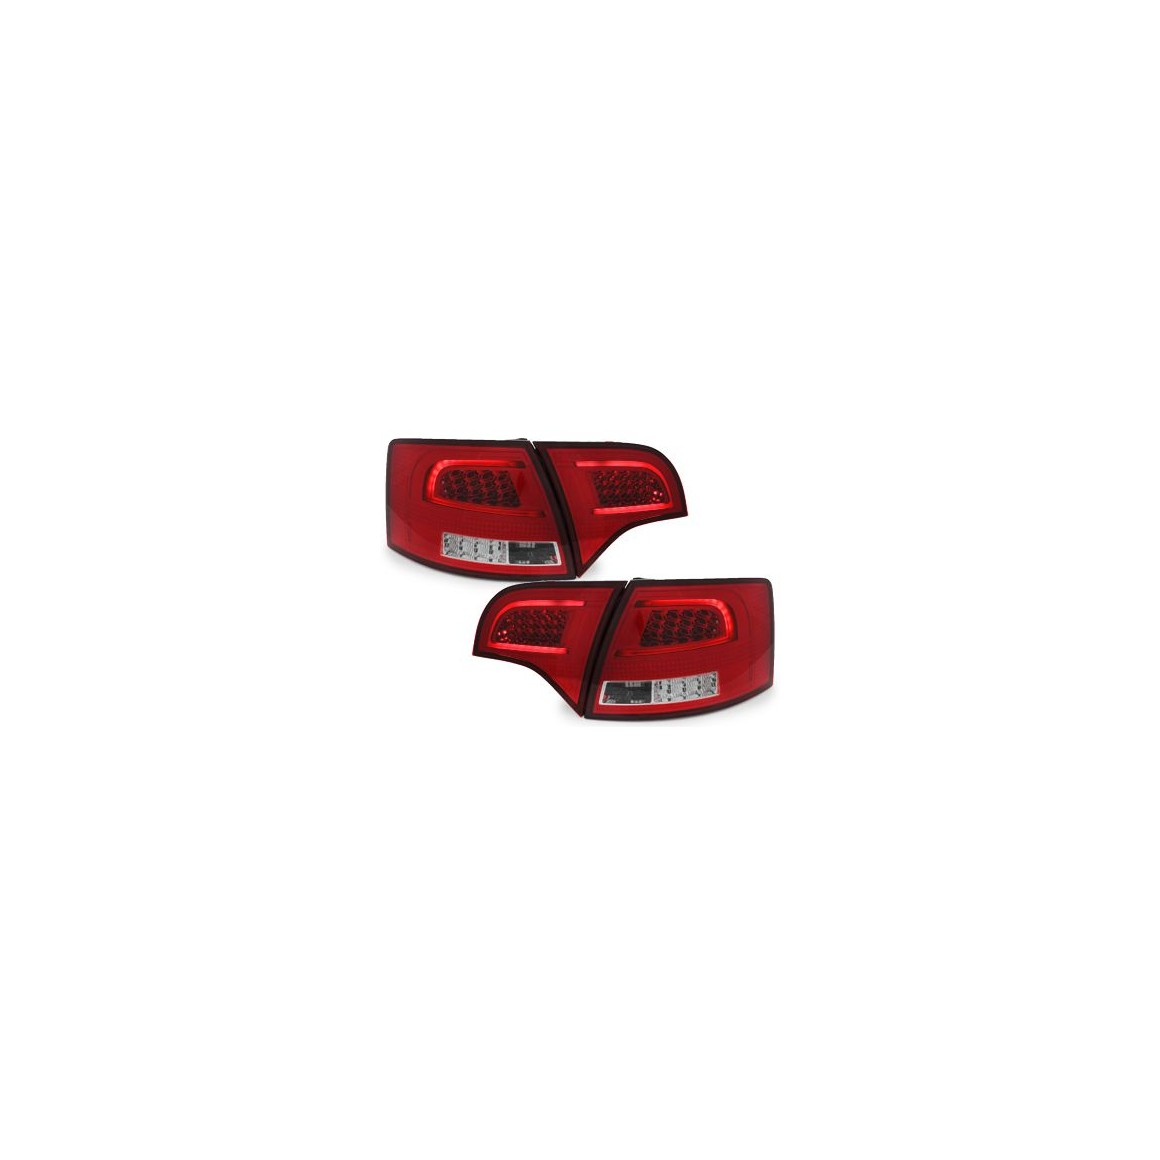 LED taillights Audi A4 Avant B7 04-08_red/chrome